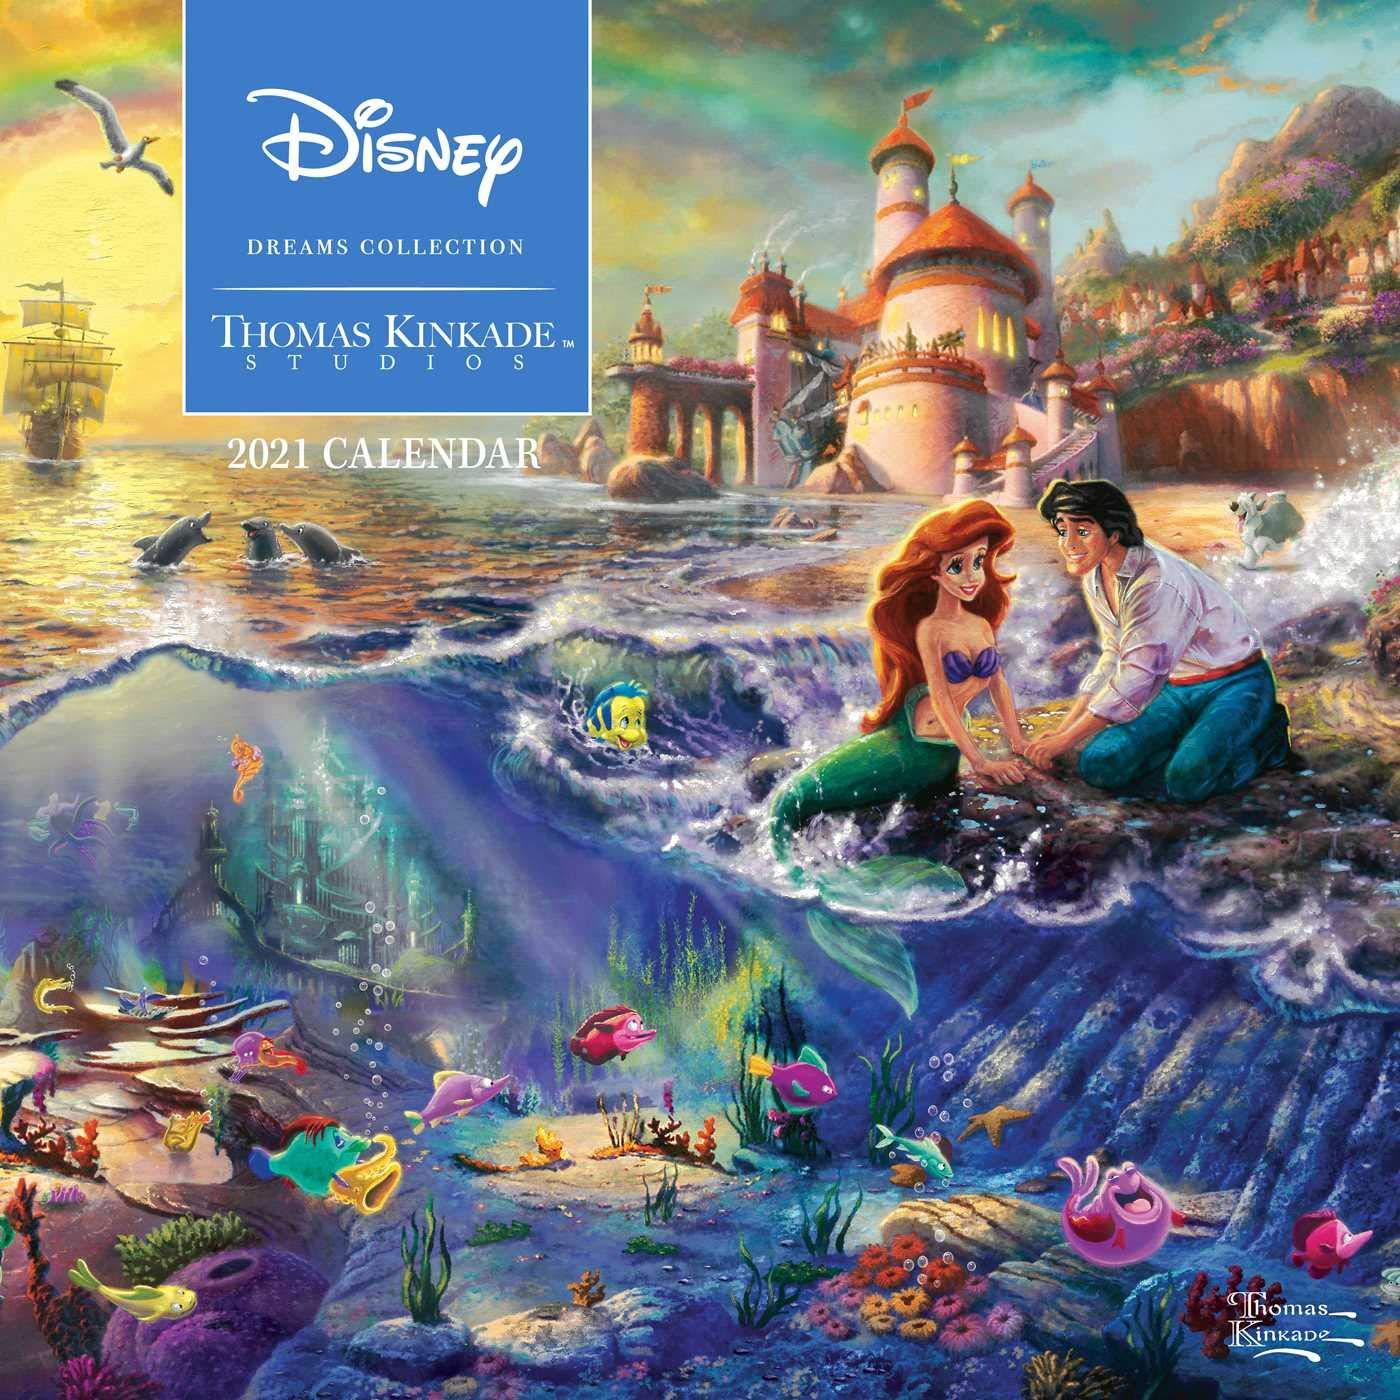 Thomas Kinkade Disney Calendar 2021 Amazon.com: Disney Dreams Collection by Thomas Kinkade Studios